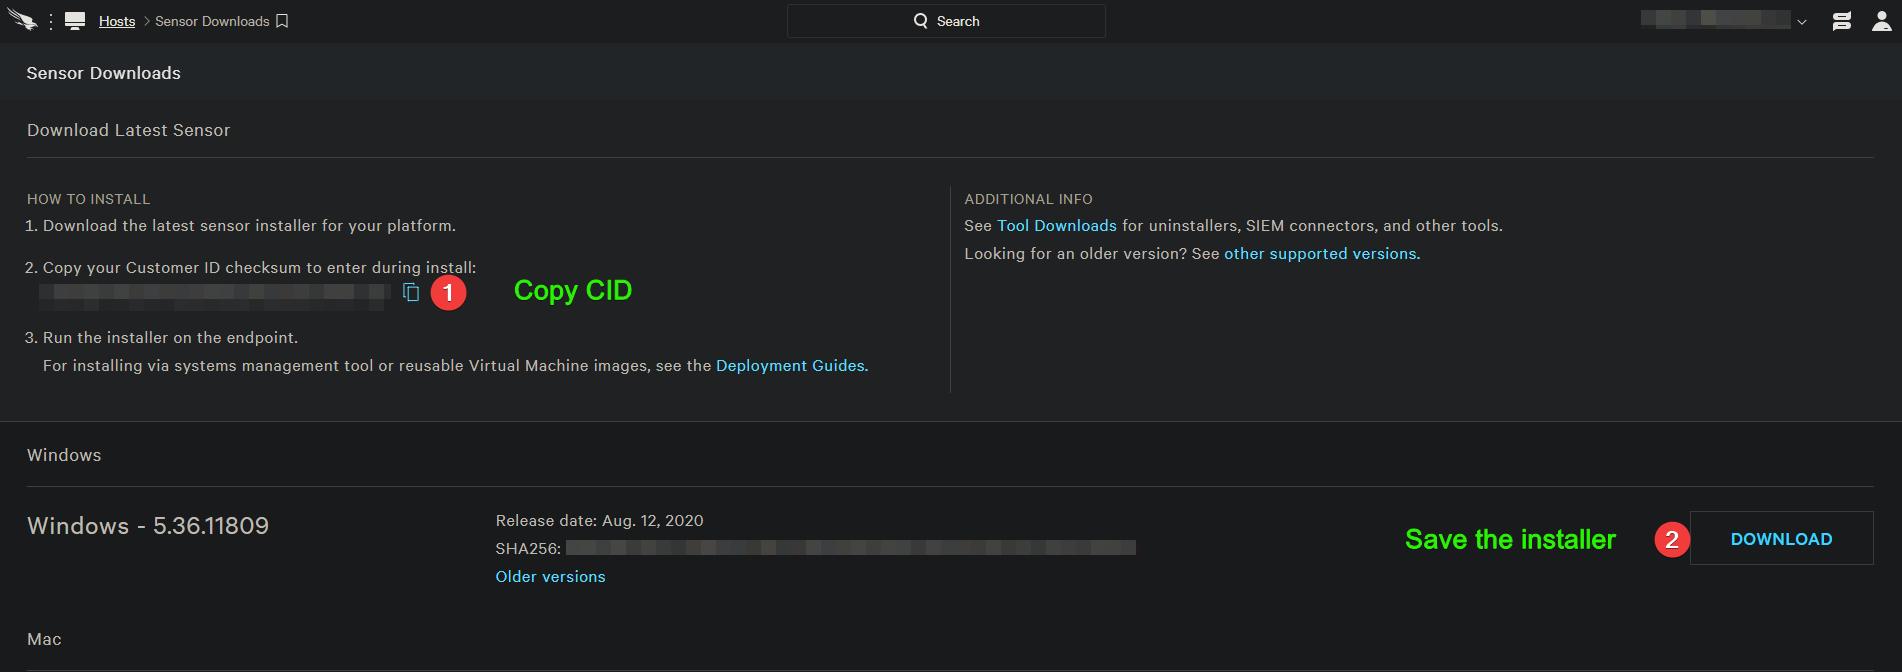 Crowdstrike Falcon Sensor Downloads dashboard